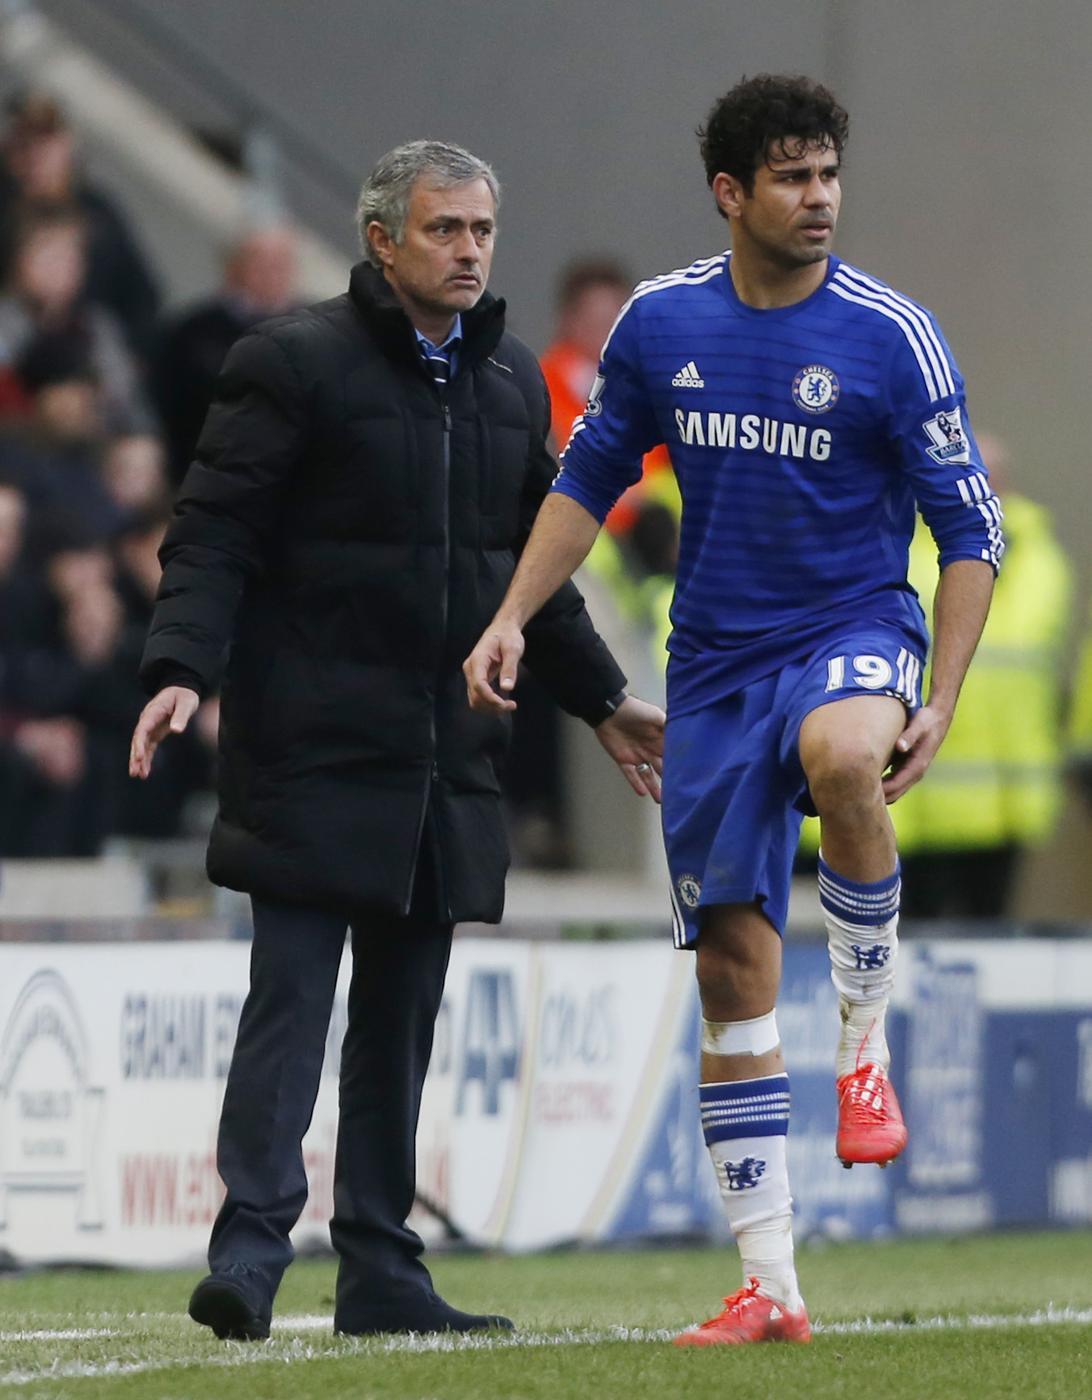 How will Chelsea line up against Stoke?